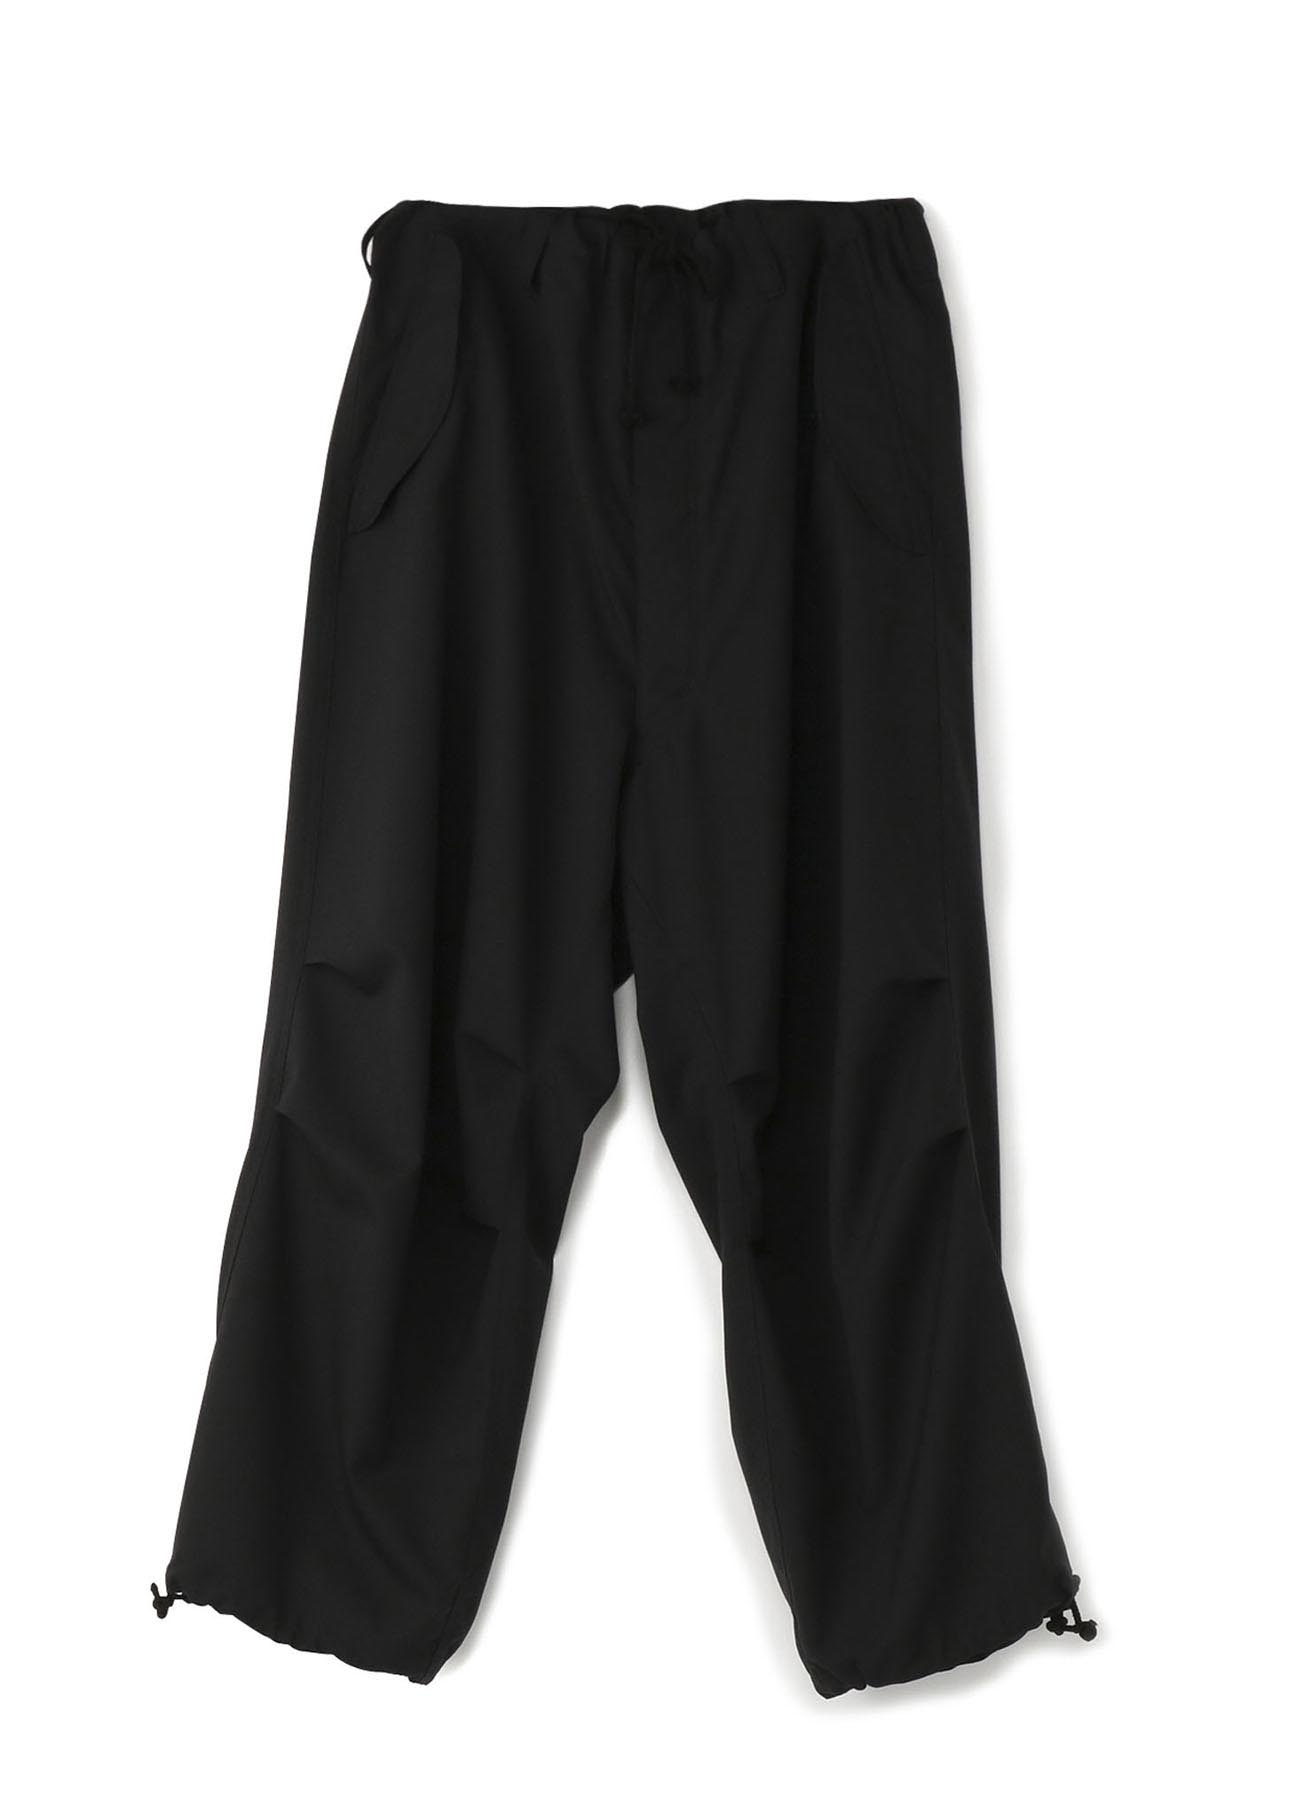 No. 8 抽绳裤 羊毛薄布料